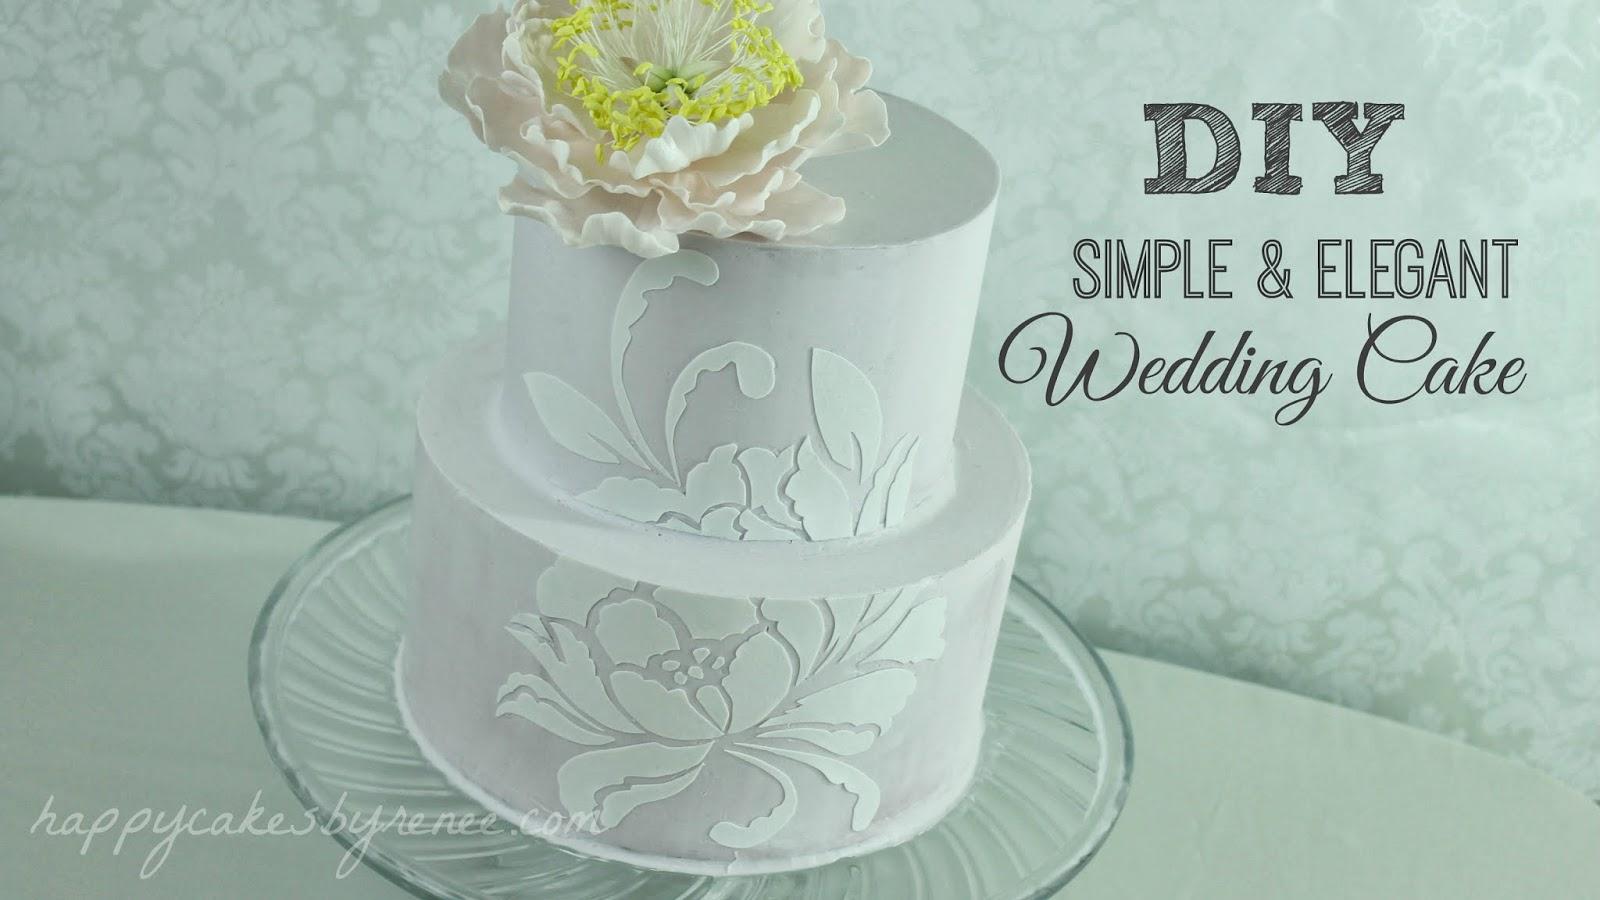 happy cakes bakes diy simple elegant wedding cake. Black Bedroom Furniture Sets. Home Design Ideas